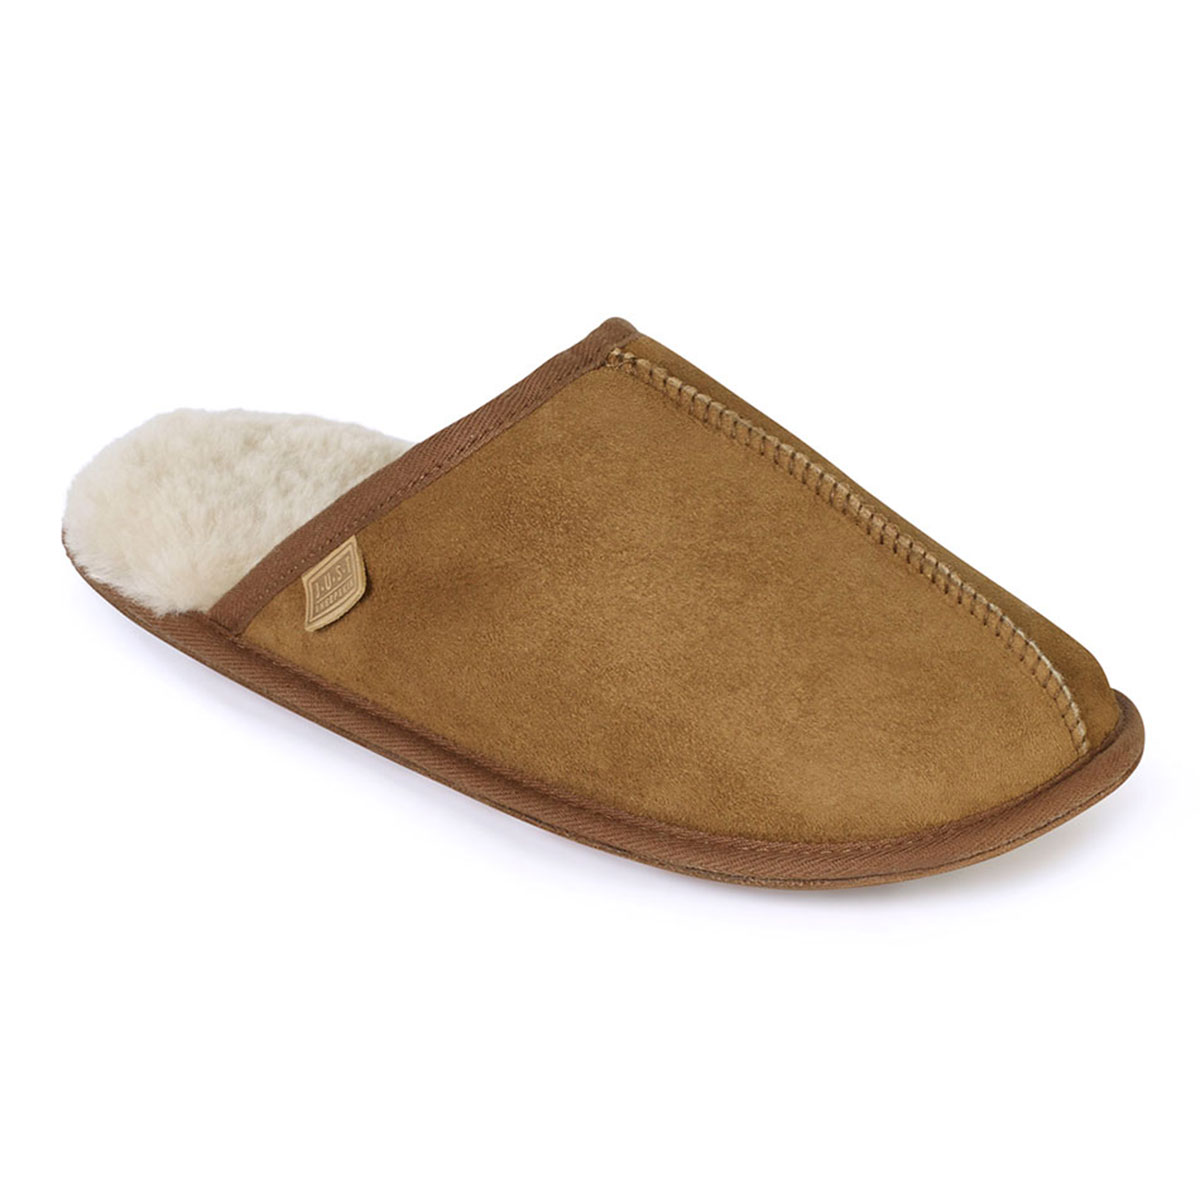 mens donmar sheepskin slippers just sheepskin slippers